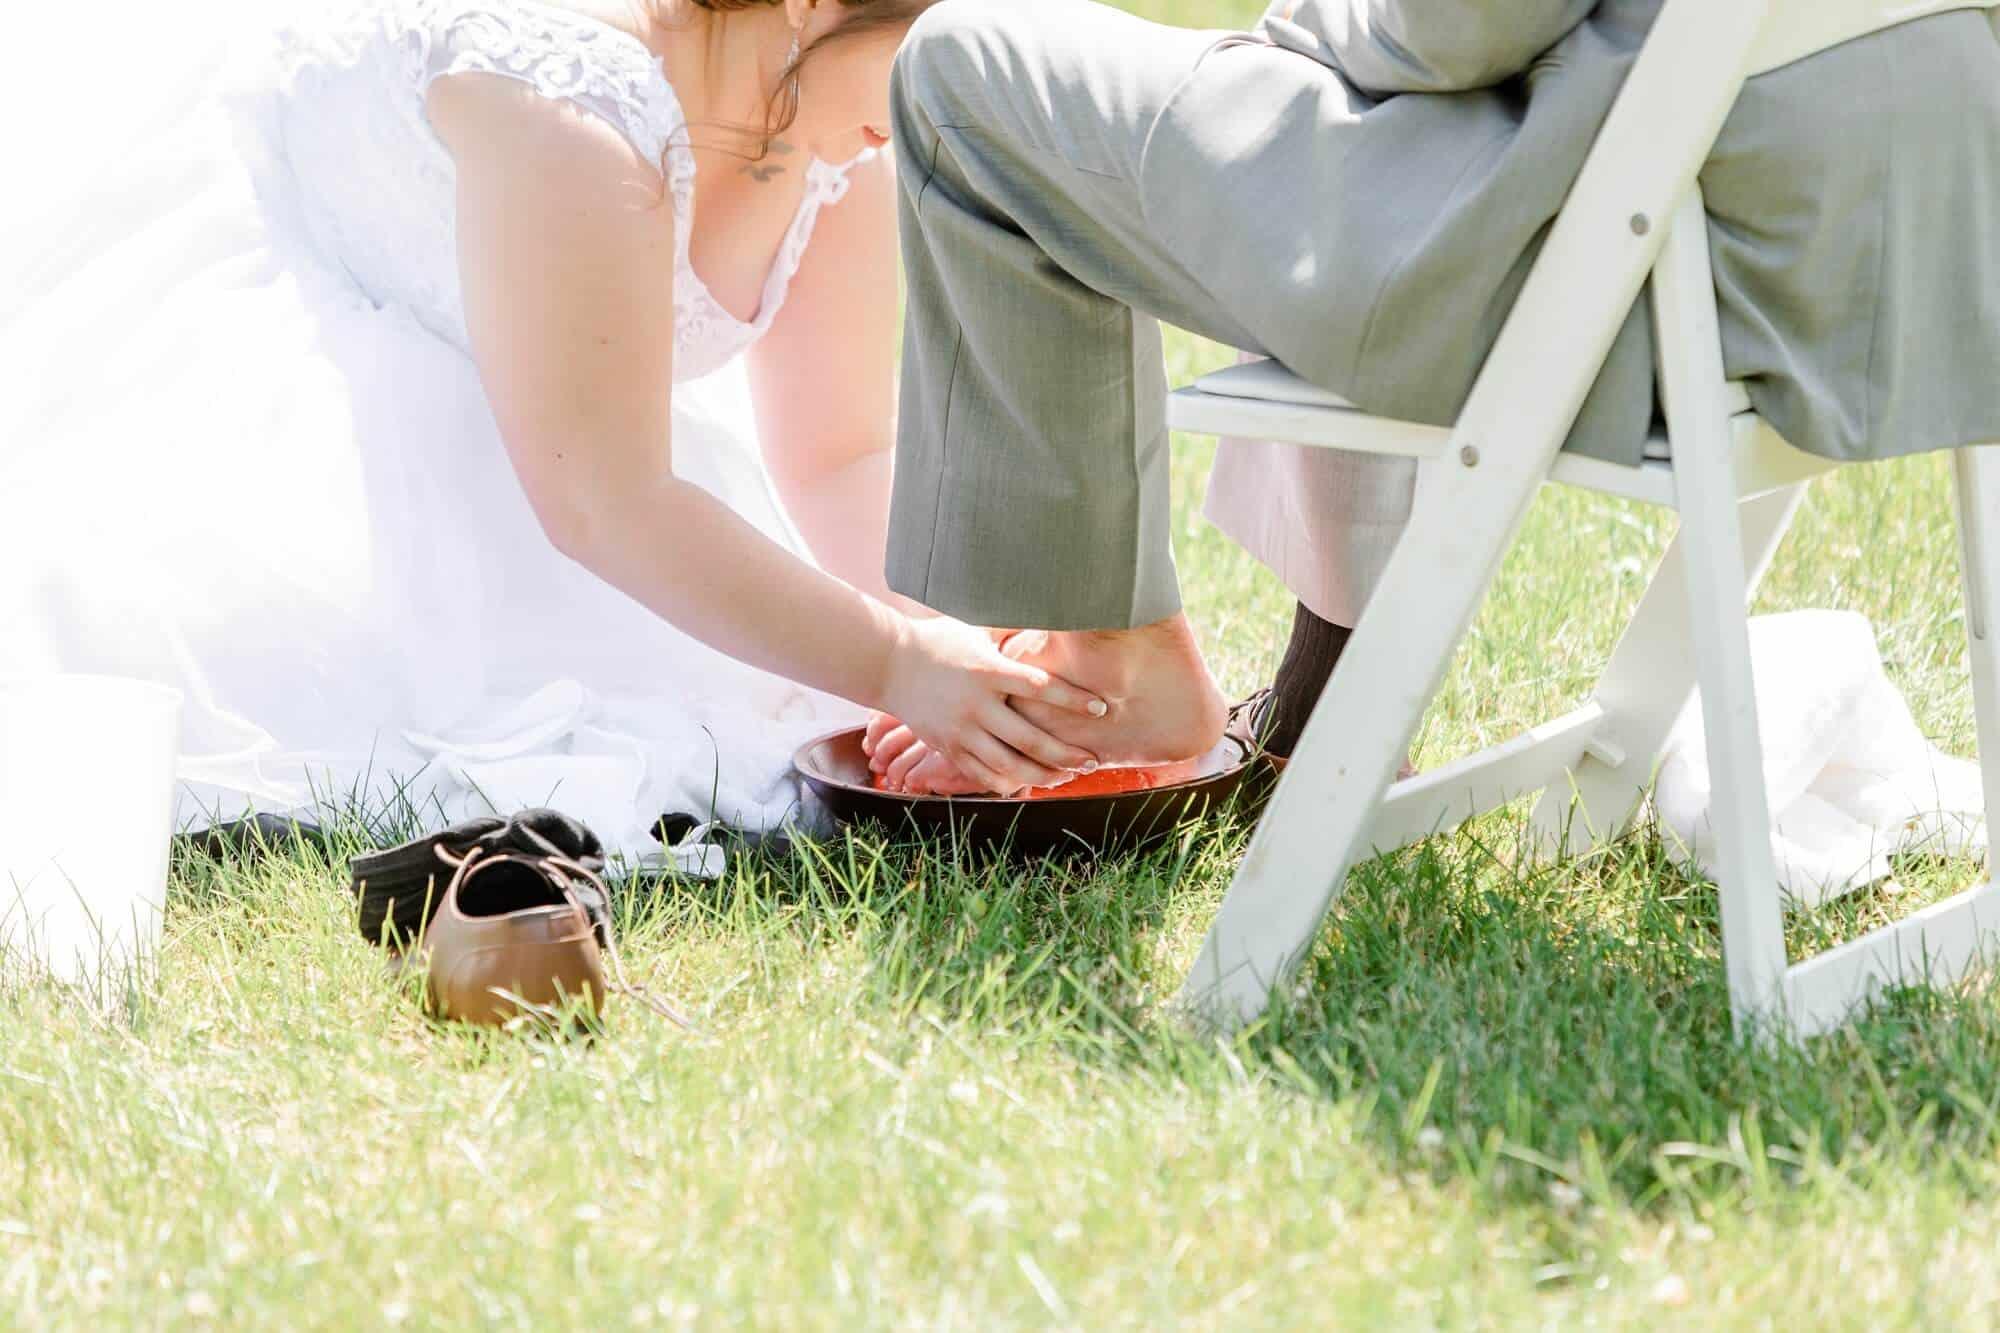 foot washing backyard wedding ceremony mansfield ohio photographer tiffany murray